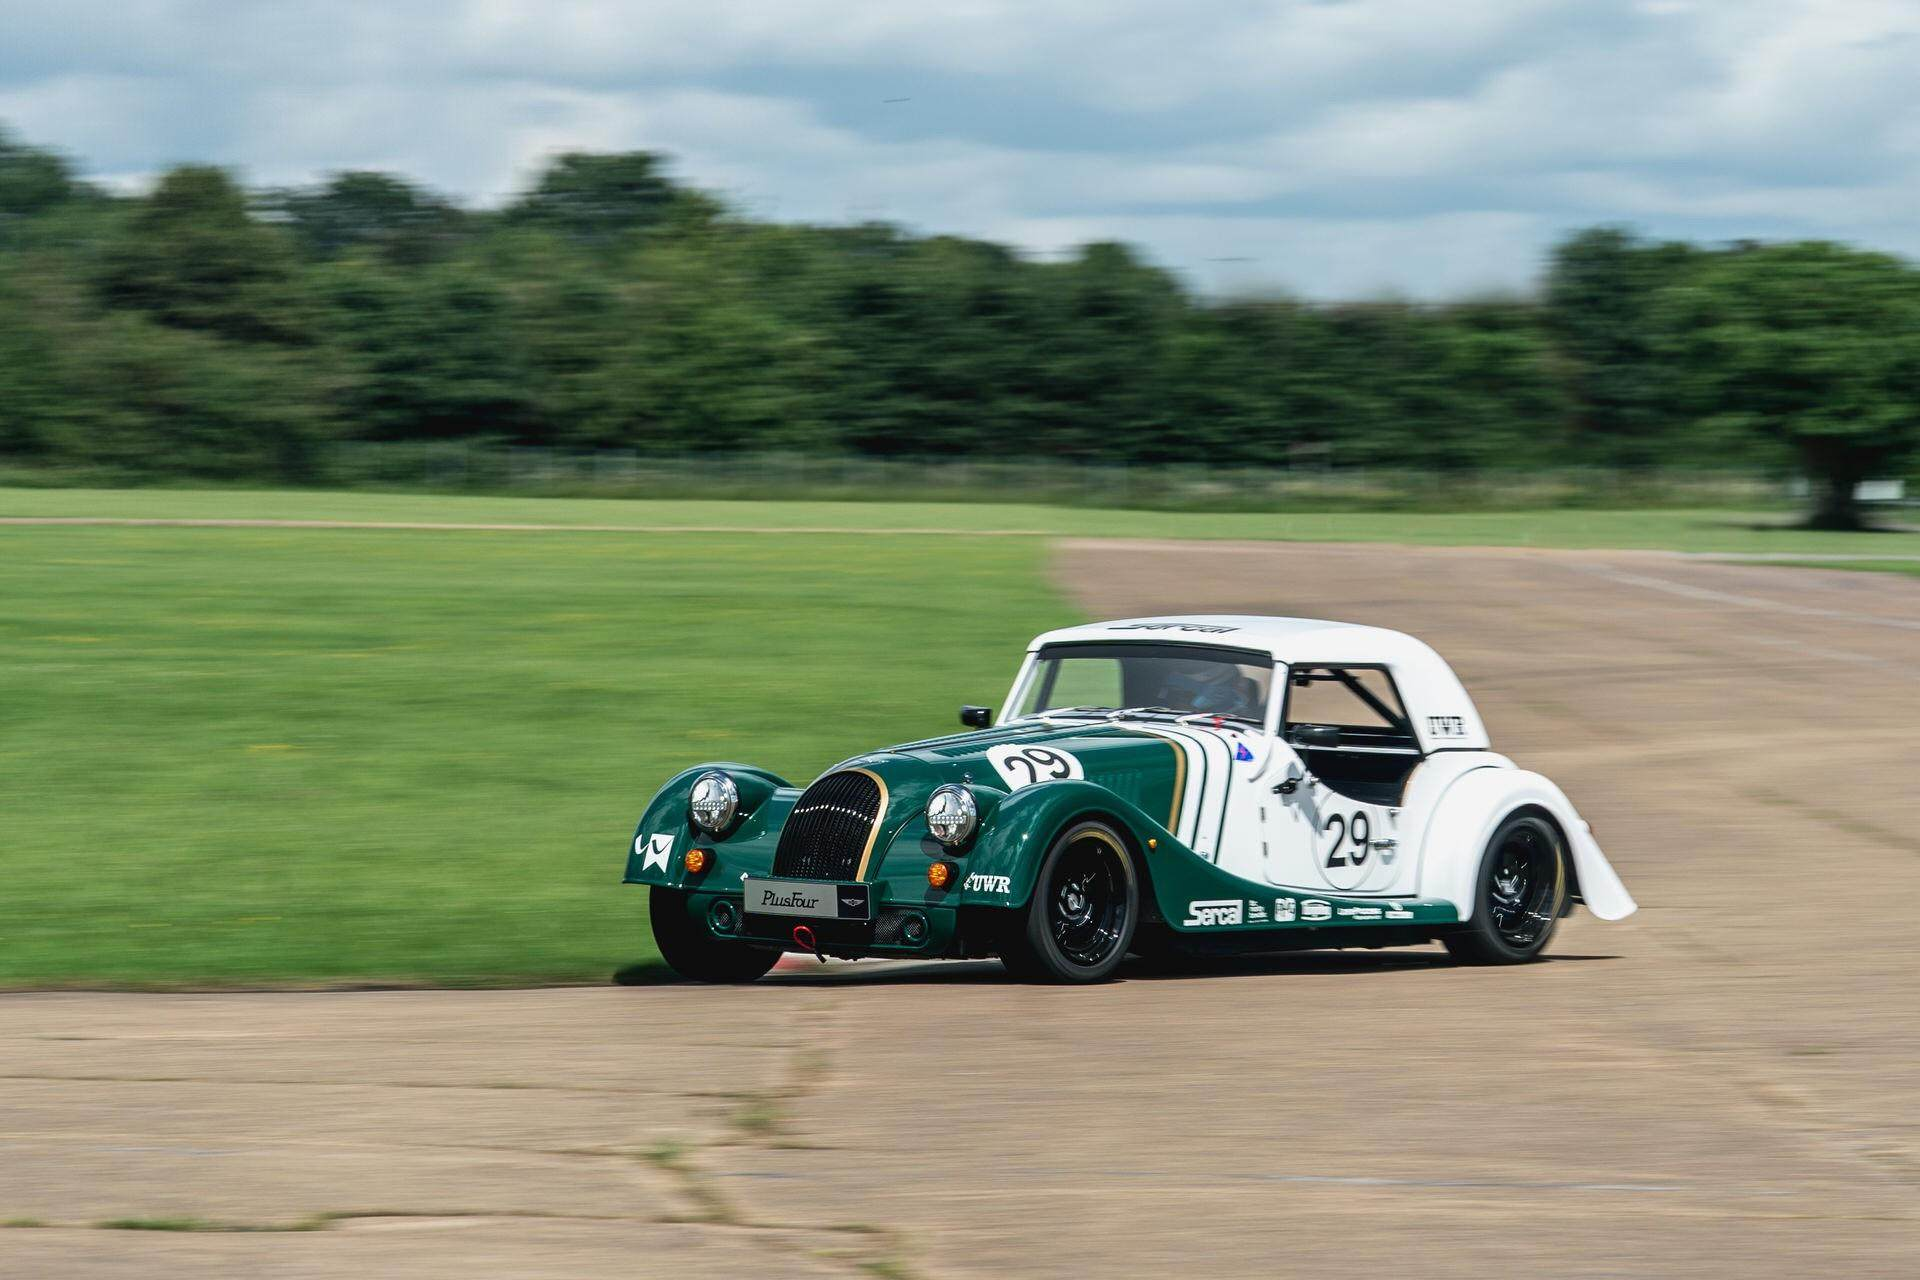 Morgan_Plus_Four_race_cars-0011